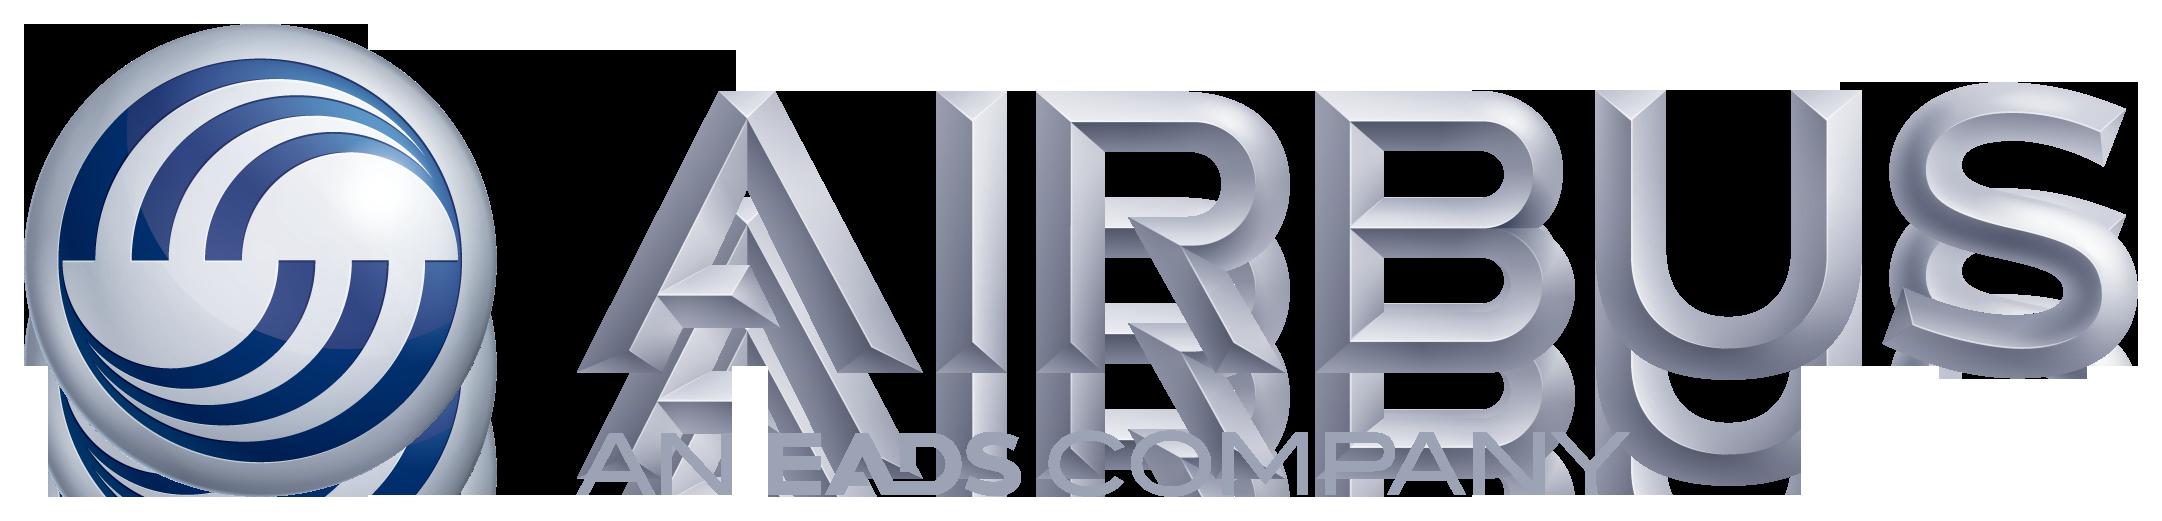 AIRBUS_logo_silver_horizontal